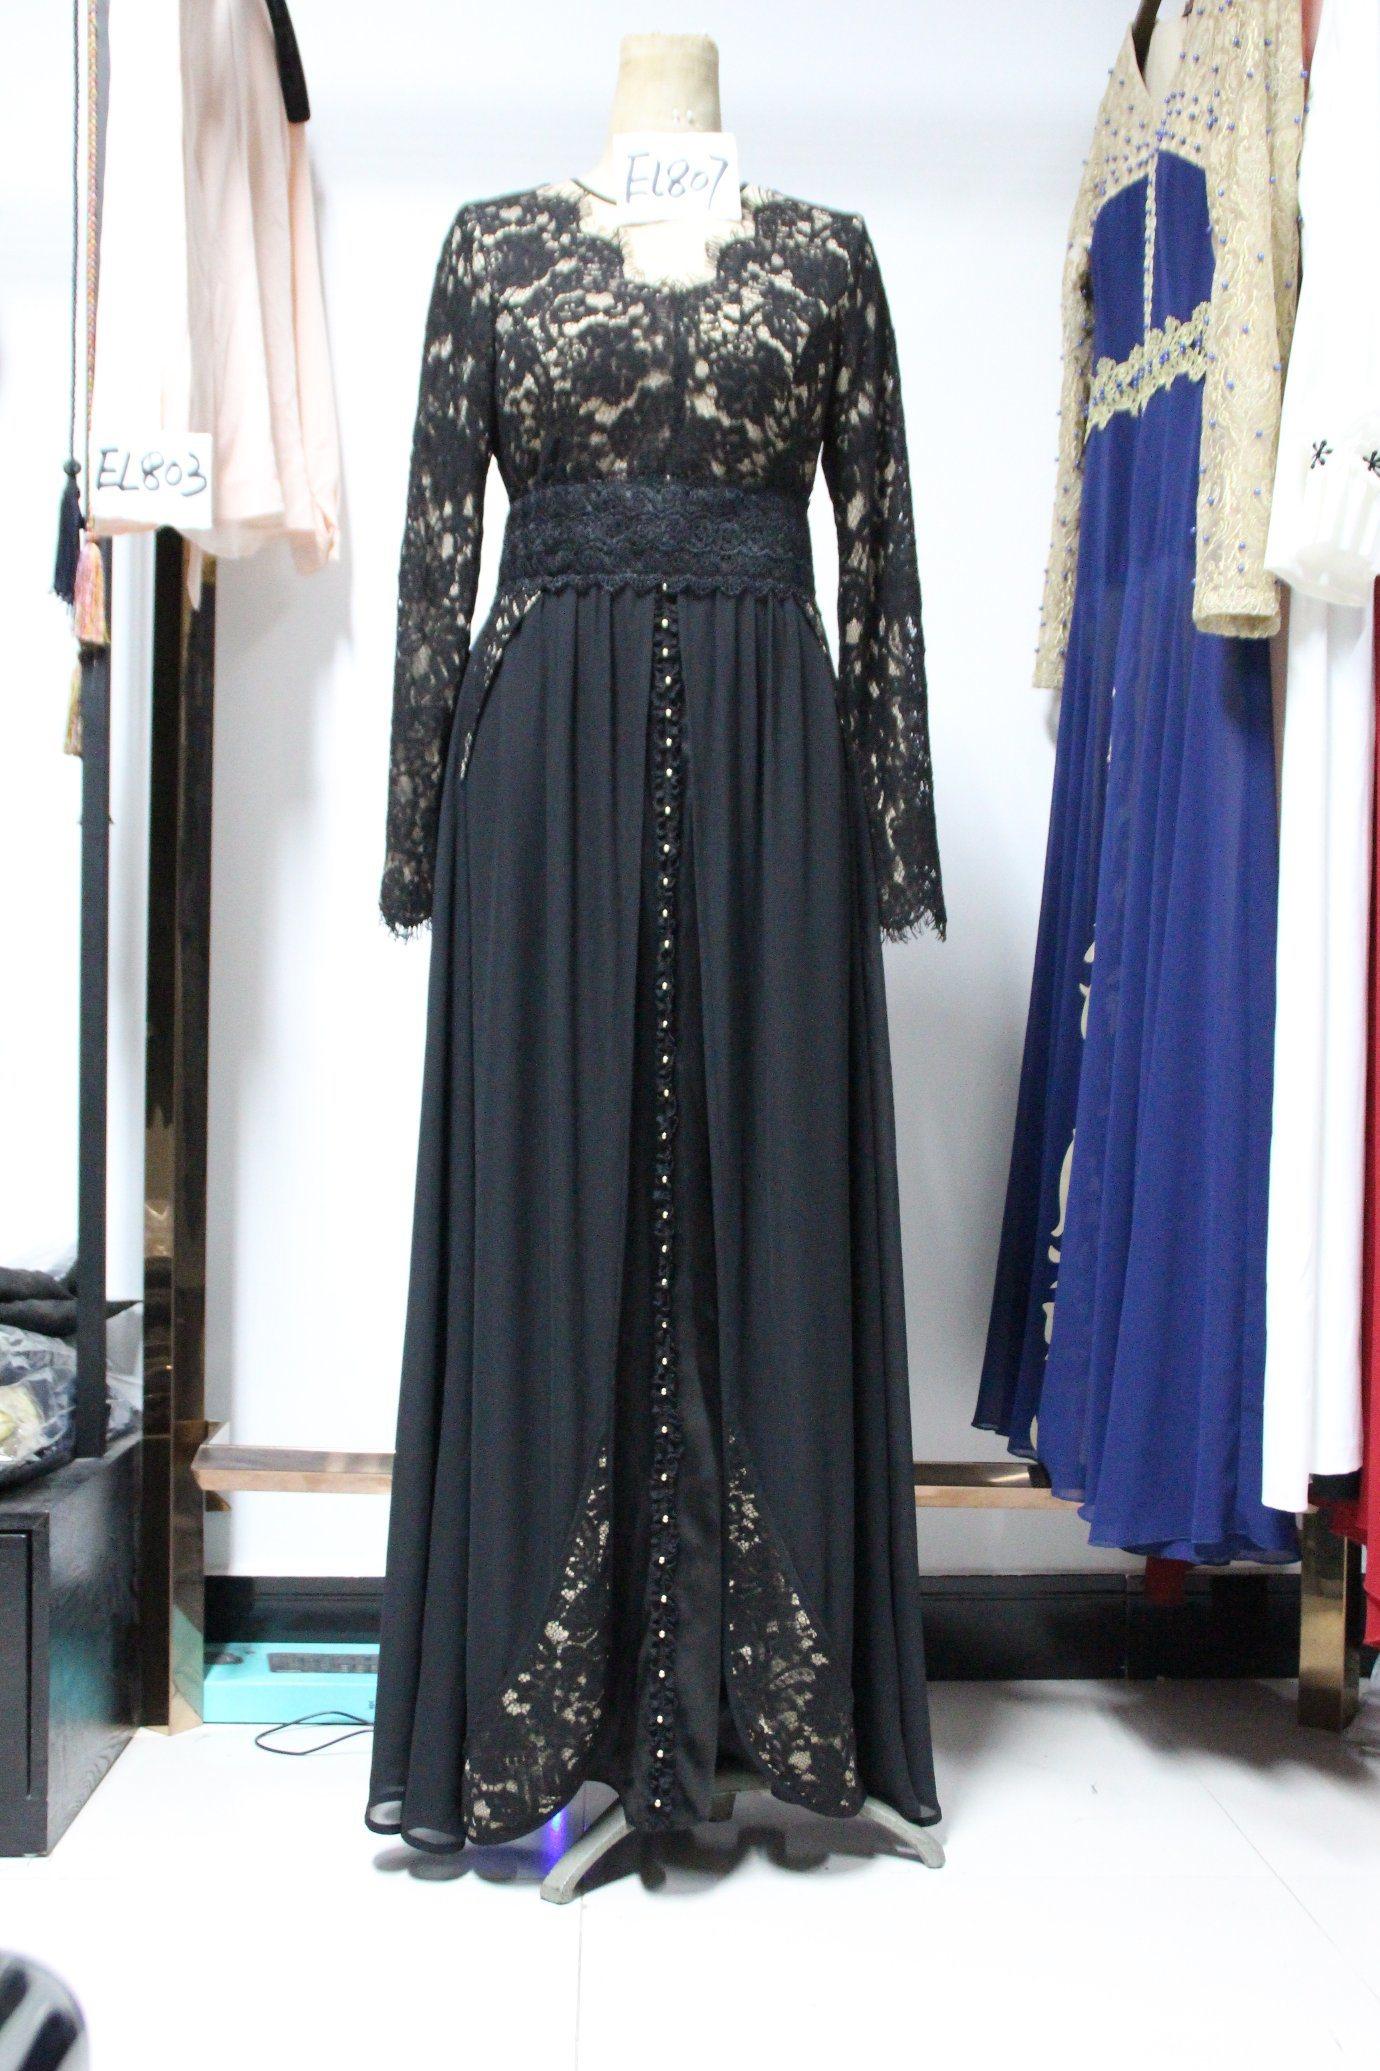 96bcb63a2d9a Long Eyelash Lace Fashion Islamic Dress Modern Black Chiffon Muslim Dress  Abaya Women Clothes